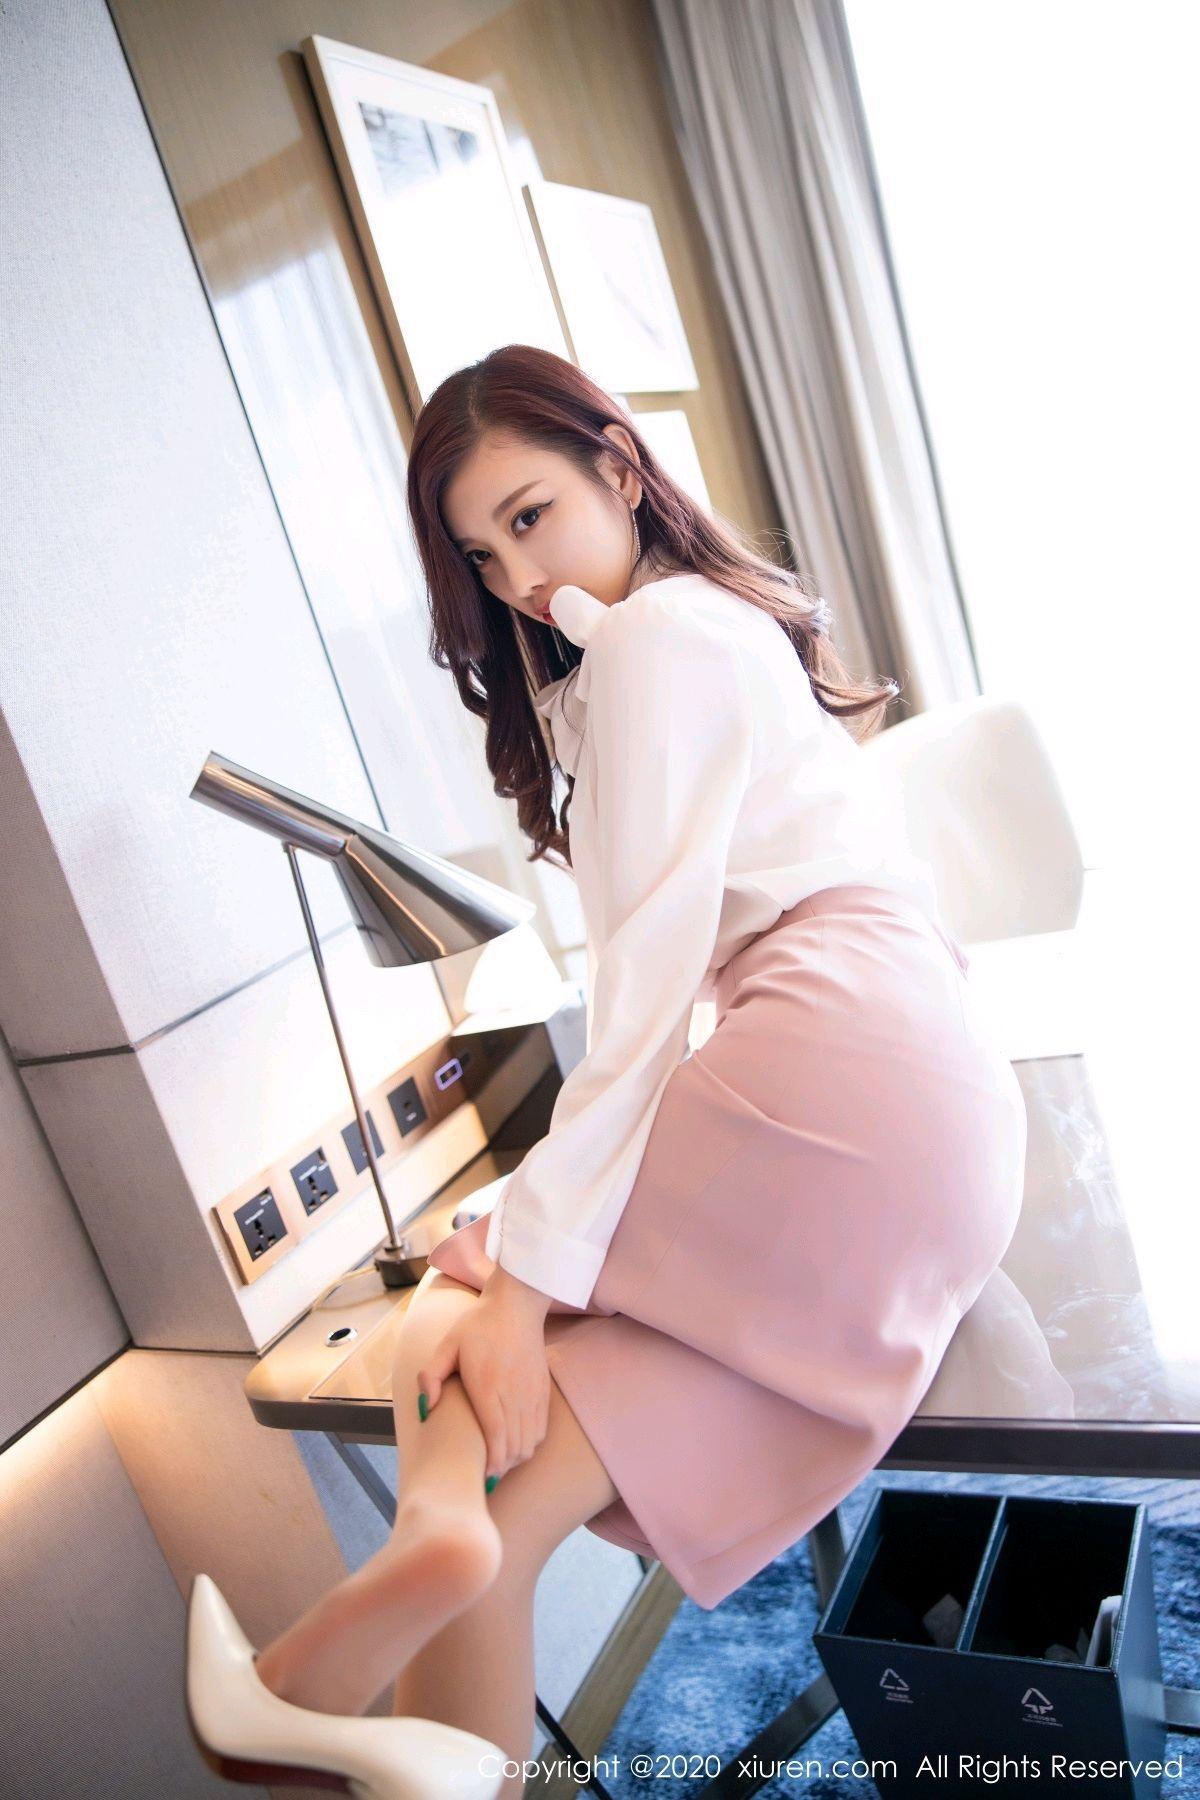 [XiuRen] Vol.2431 Yang Chen Chen 78P, Tall, Underwear, Uniform, Xiuren, Yang Chen Chen